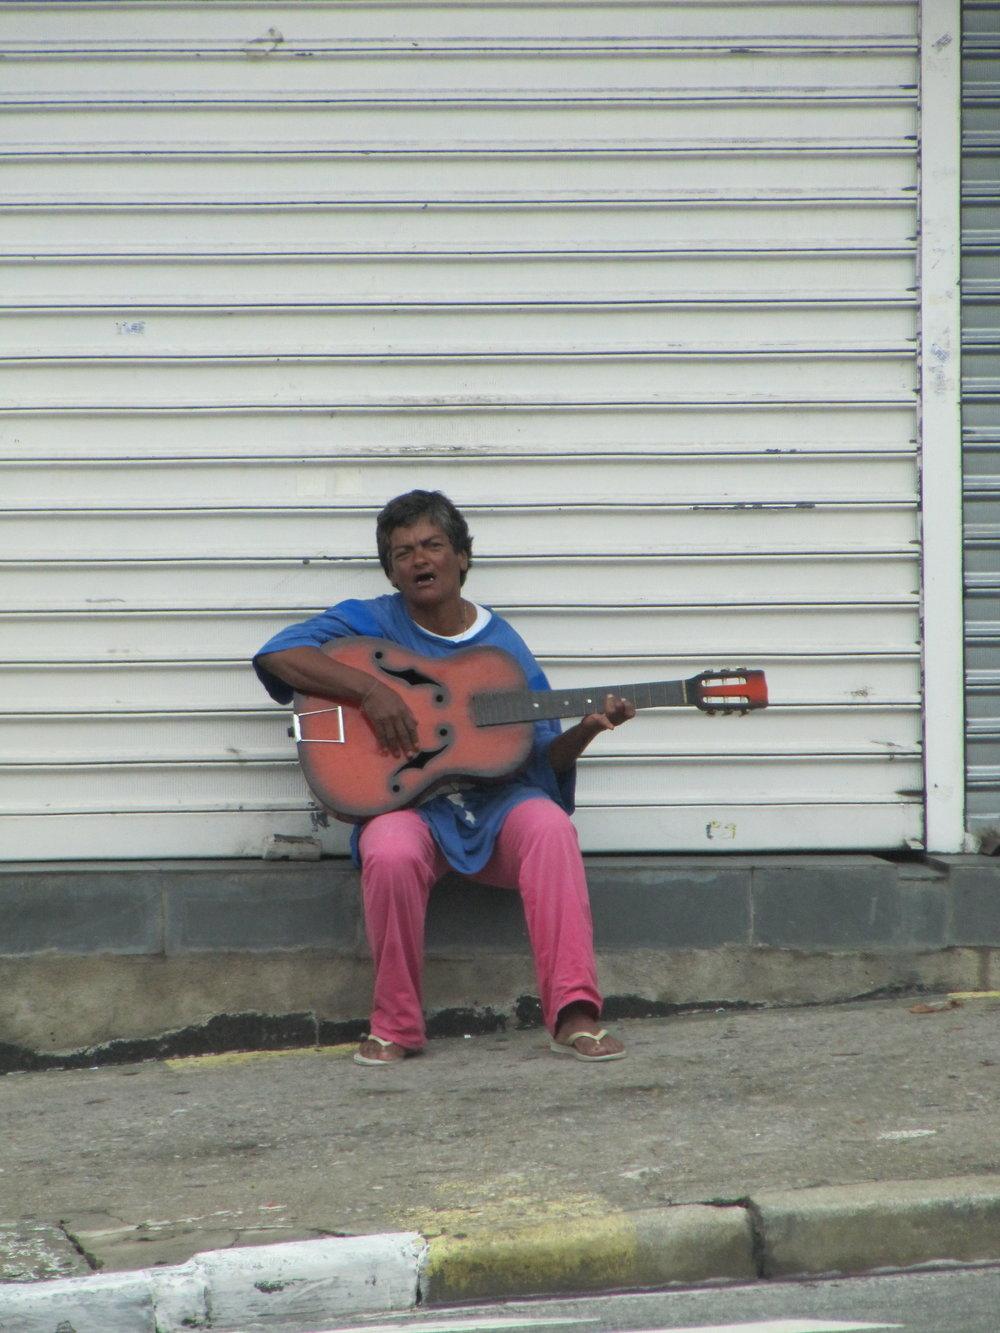 No String Guitar (Brazil 2009 ©MiloMcKinnon)